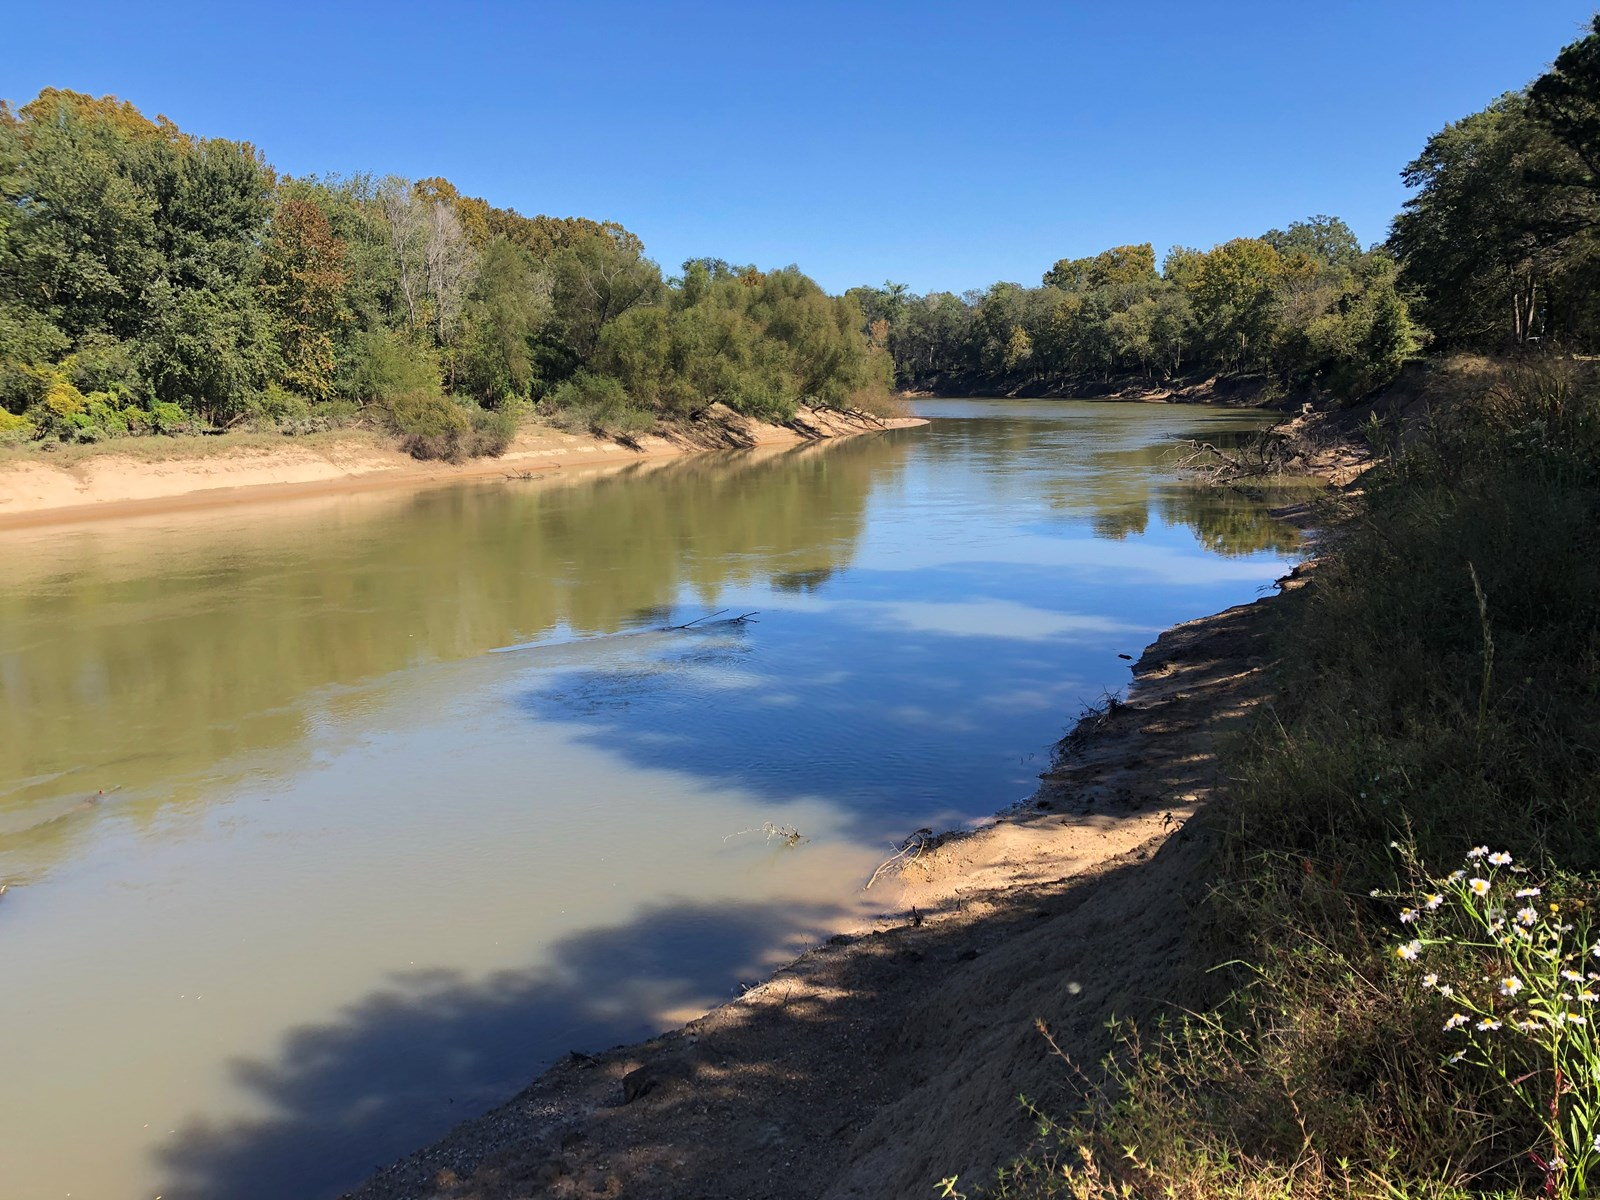 Recreational Land for Sale on Ouachita River near Camden, AR